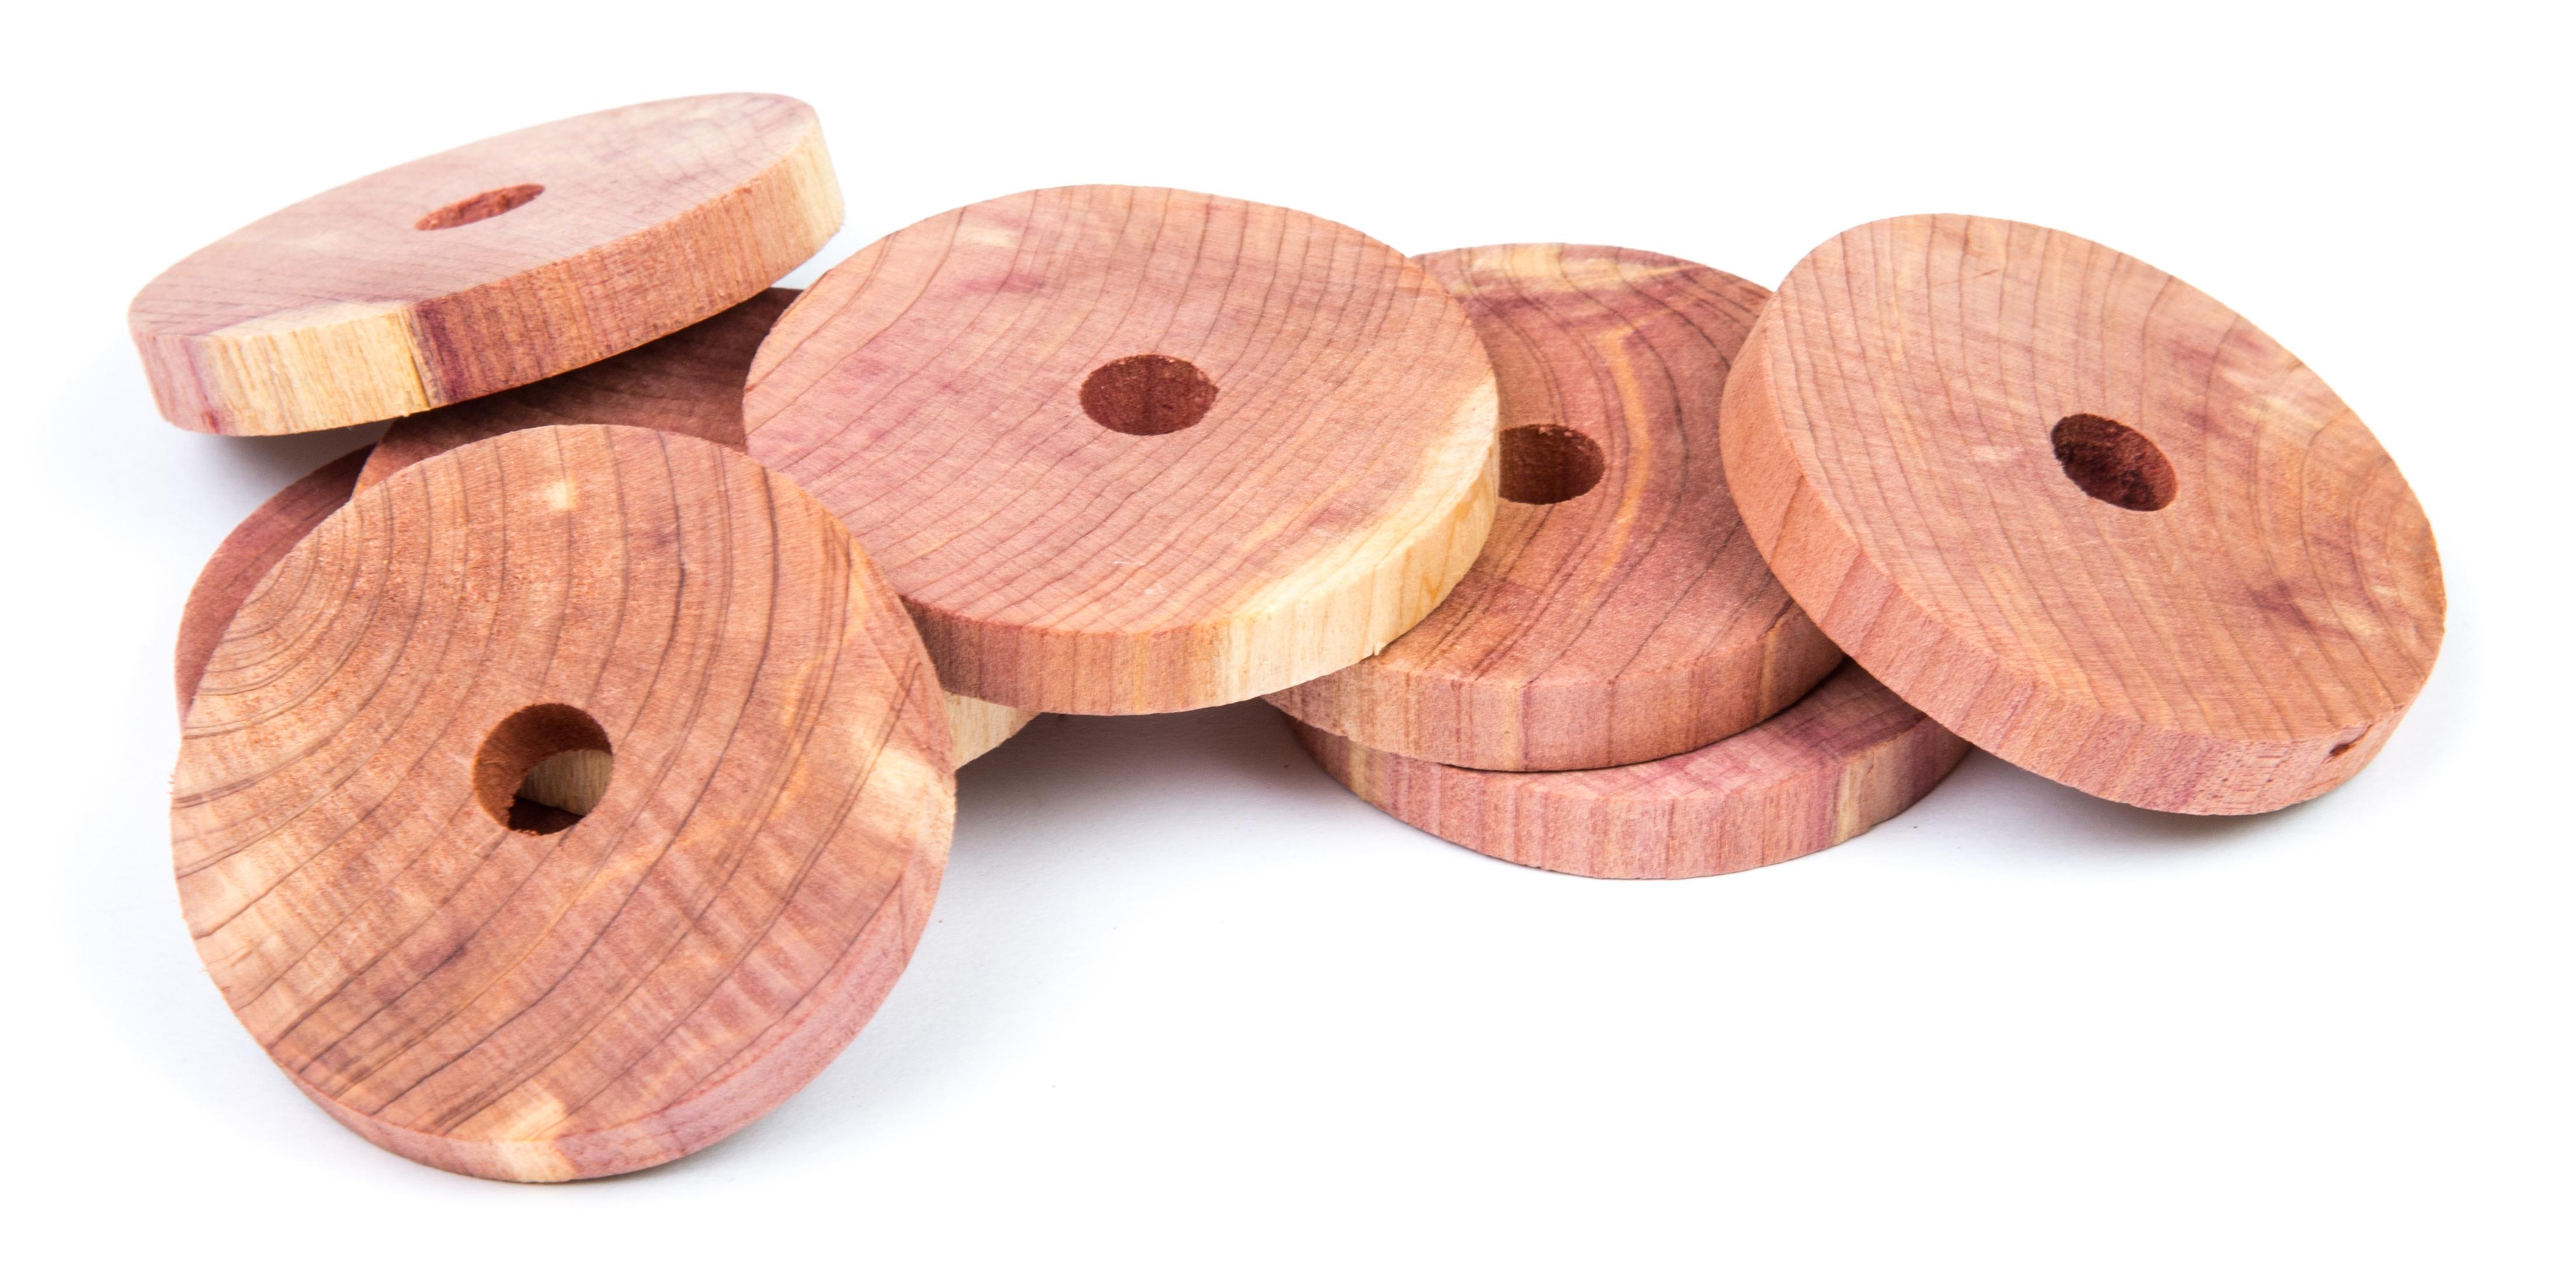 Rings in cedar